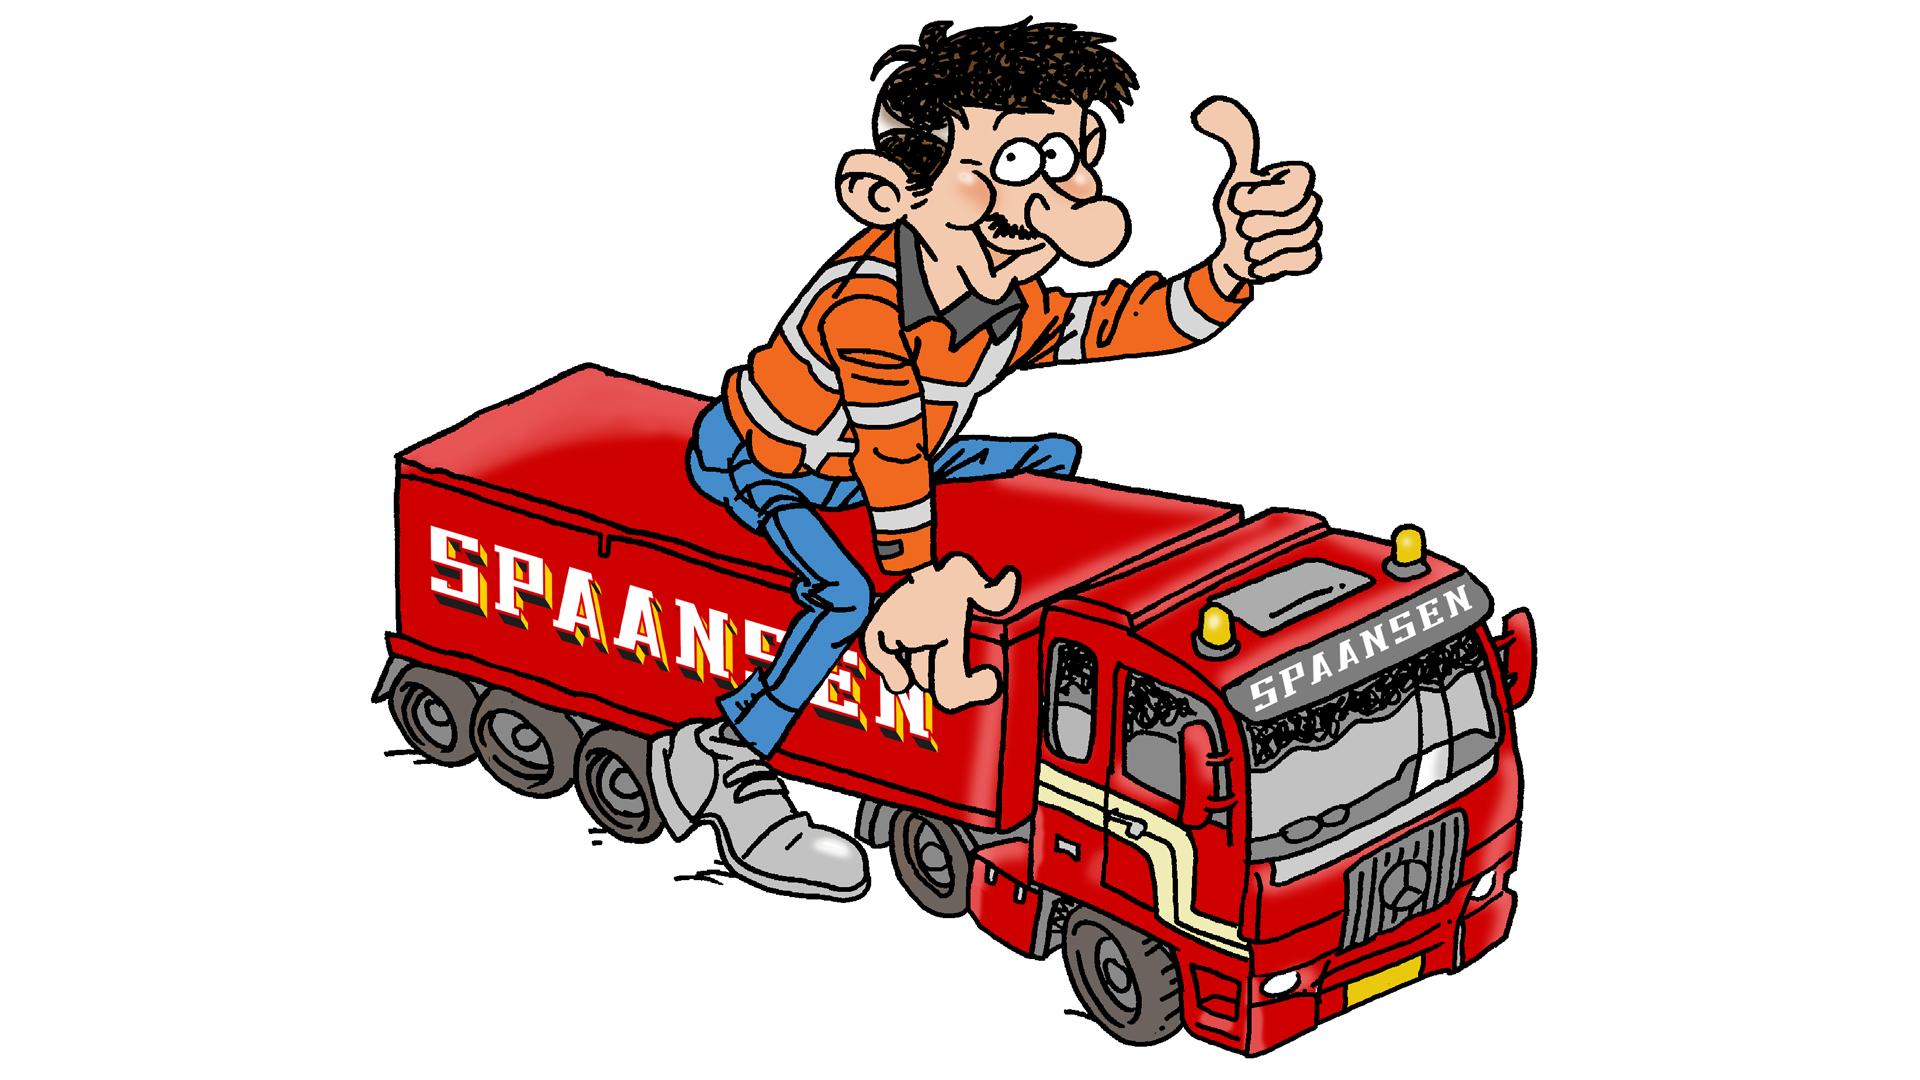 Vacature, Chauffeur, Winkel, Spaansen Grondstoffen en Logistiek B.V.